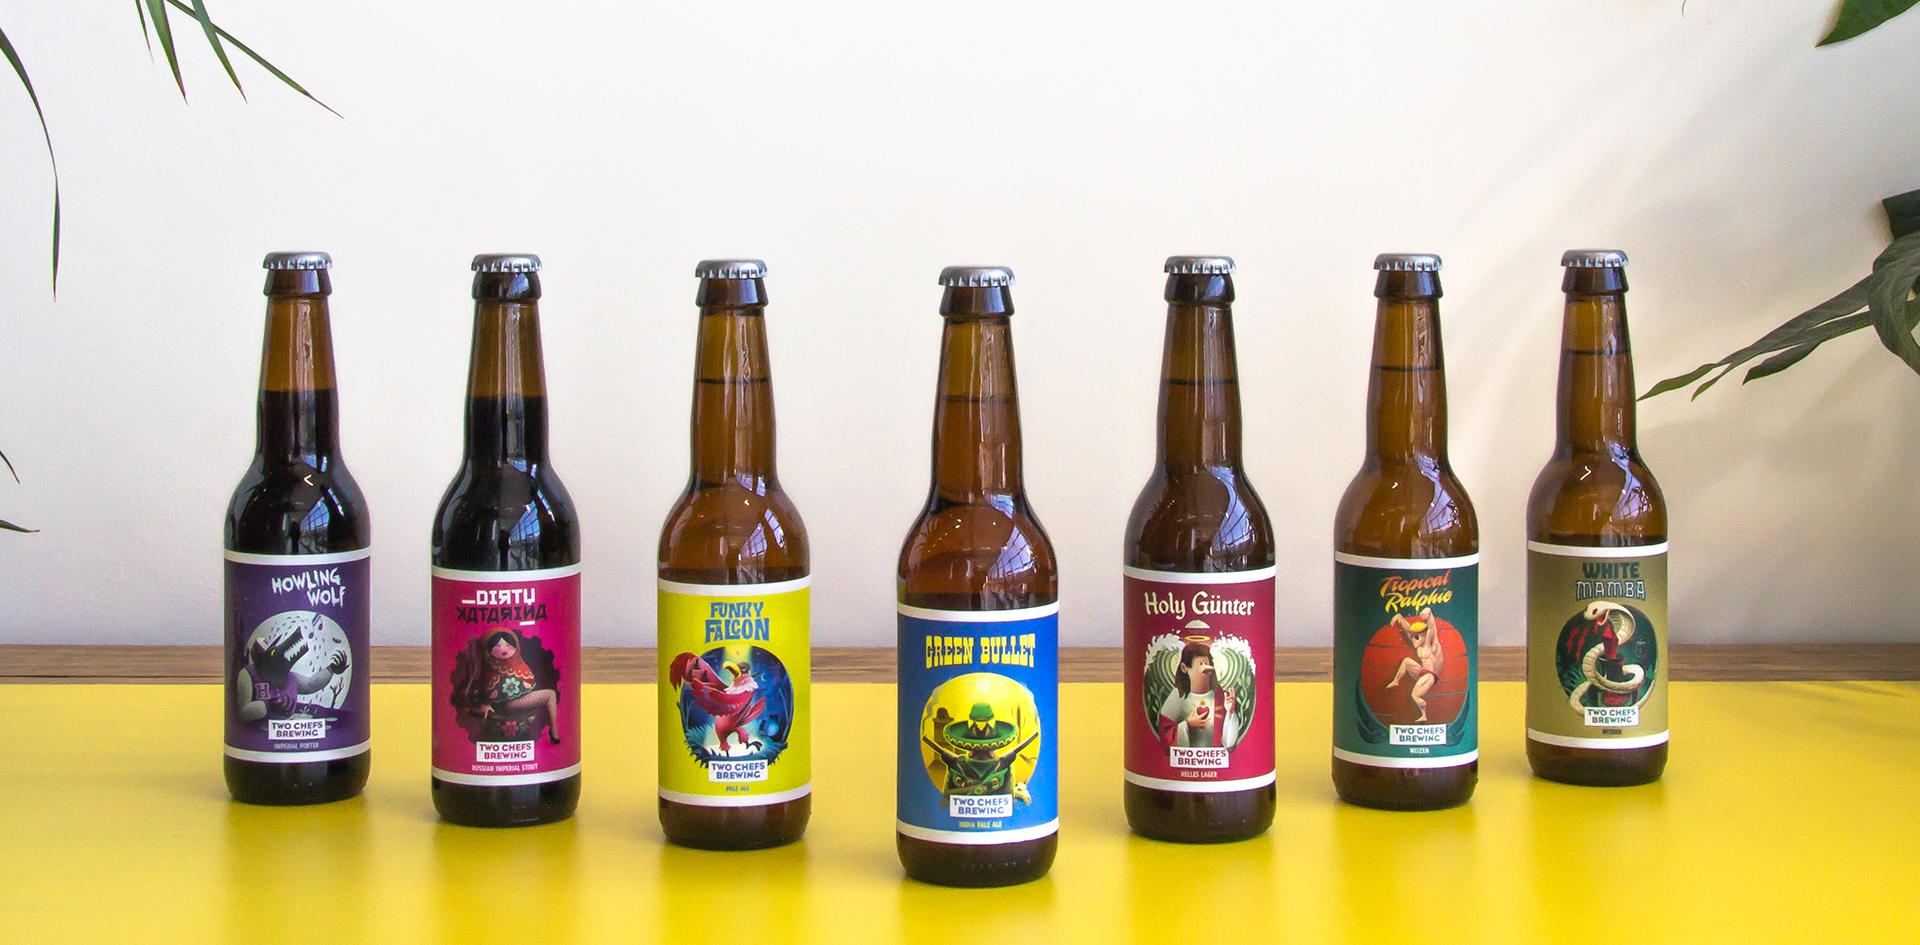 nectar-utrecht-pils-bier-brouwerij-nederland-streekbier-amsterdam-two-chefs-assortiment